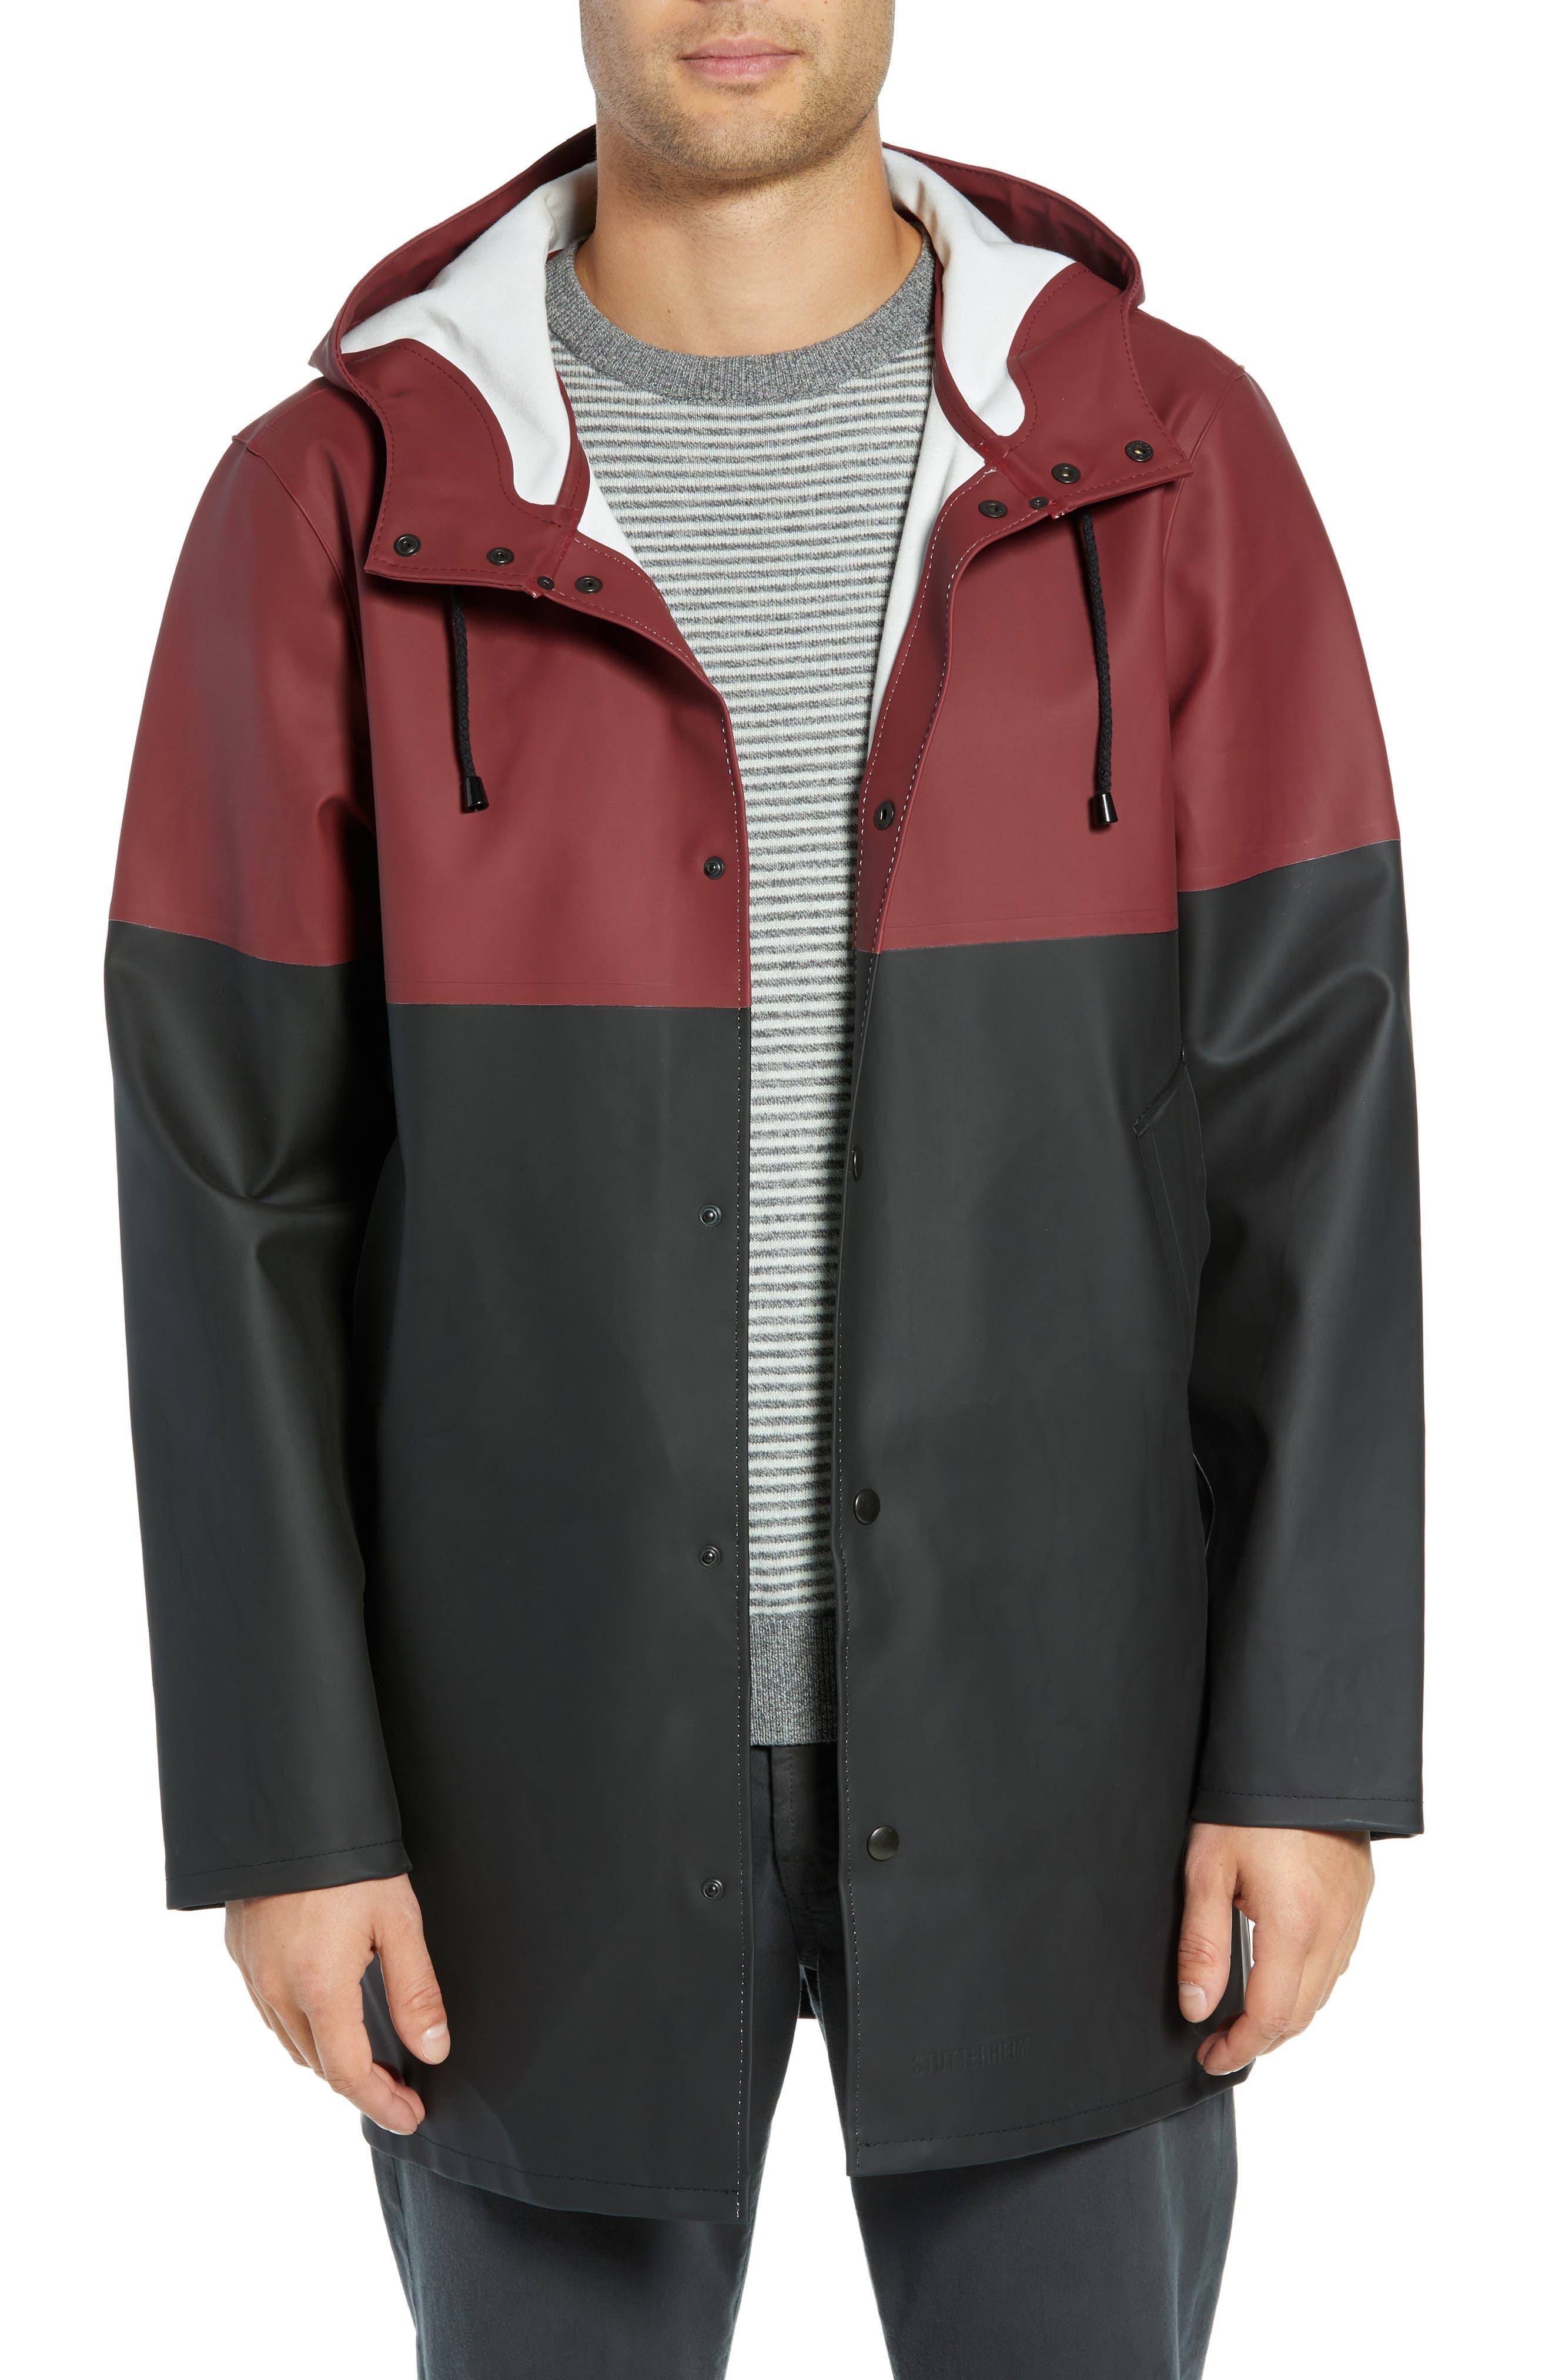 Stockholm Colorblock Waterproof Hooded Raincoat,                             Main thumbnail 1, color,                             BURGUNDY/ BLACK